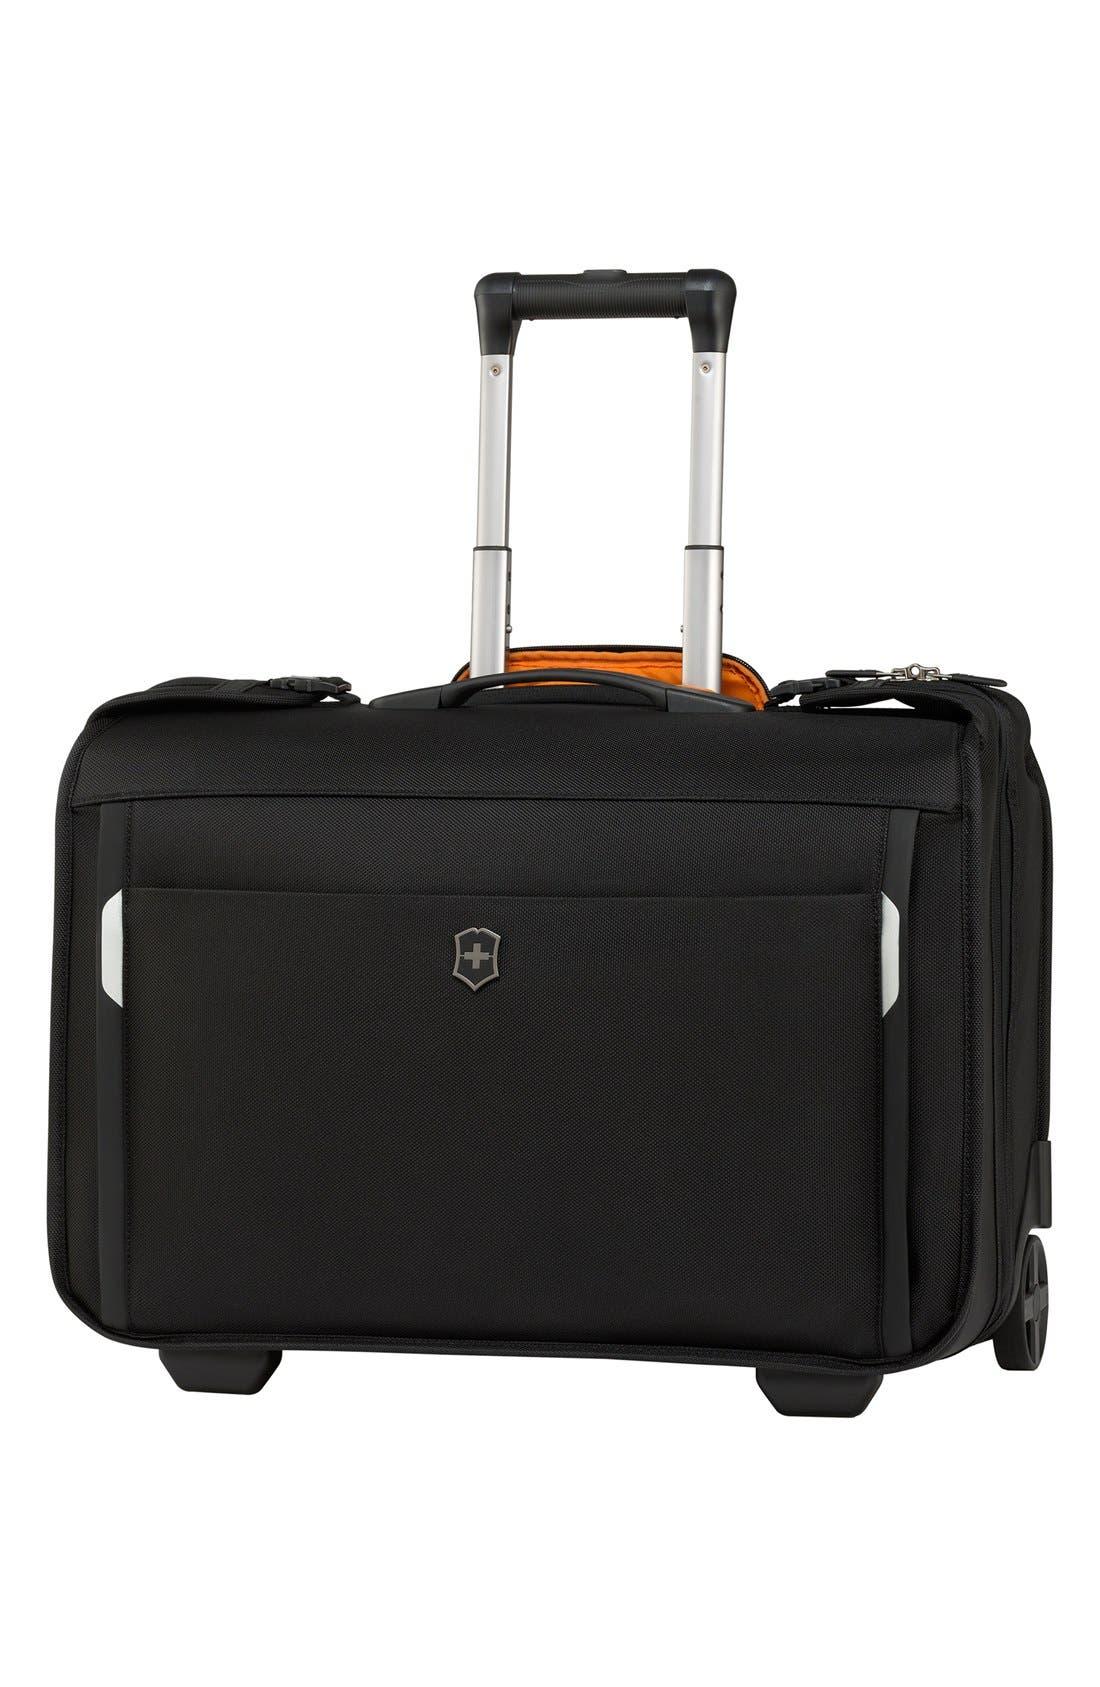 WT 5.0 - East/West Wheeled Garment Bag,                         Main,                         color, 001